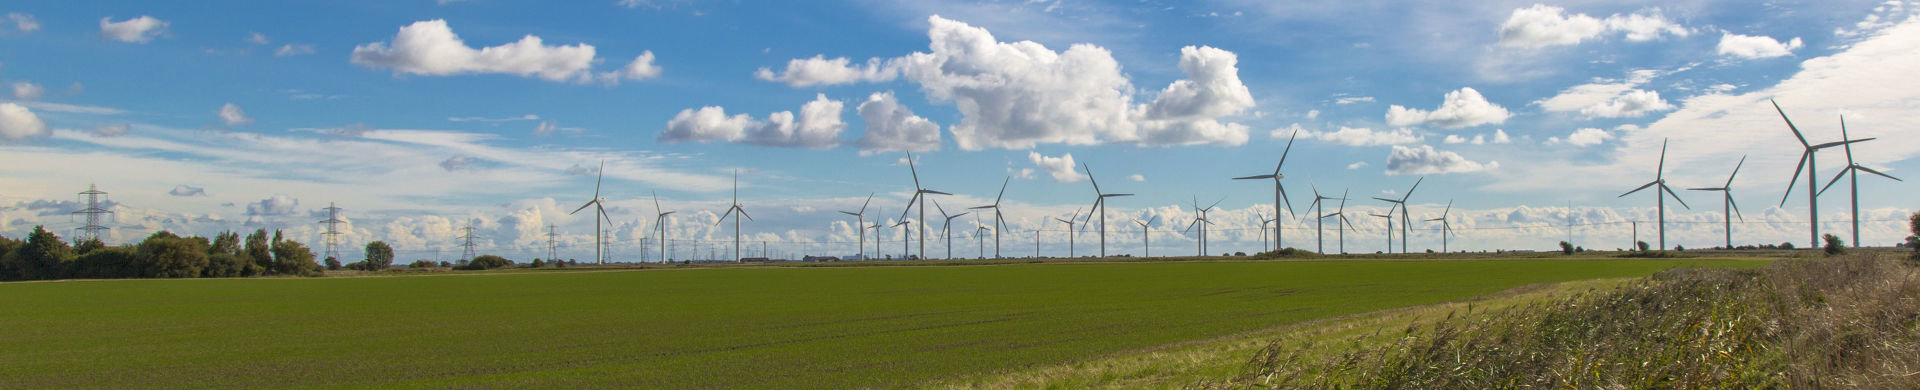 header-windmolens-cc0-neil-crook-via-pixabay